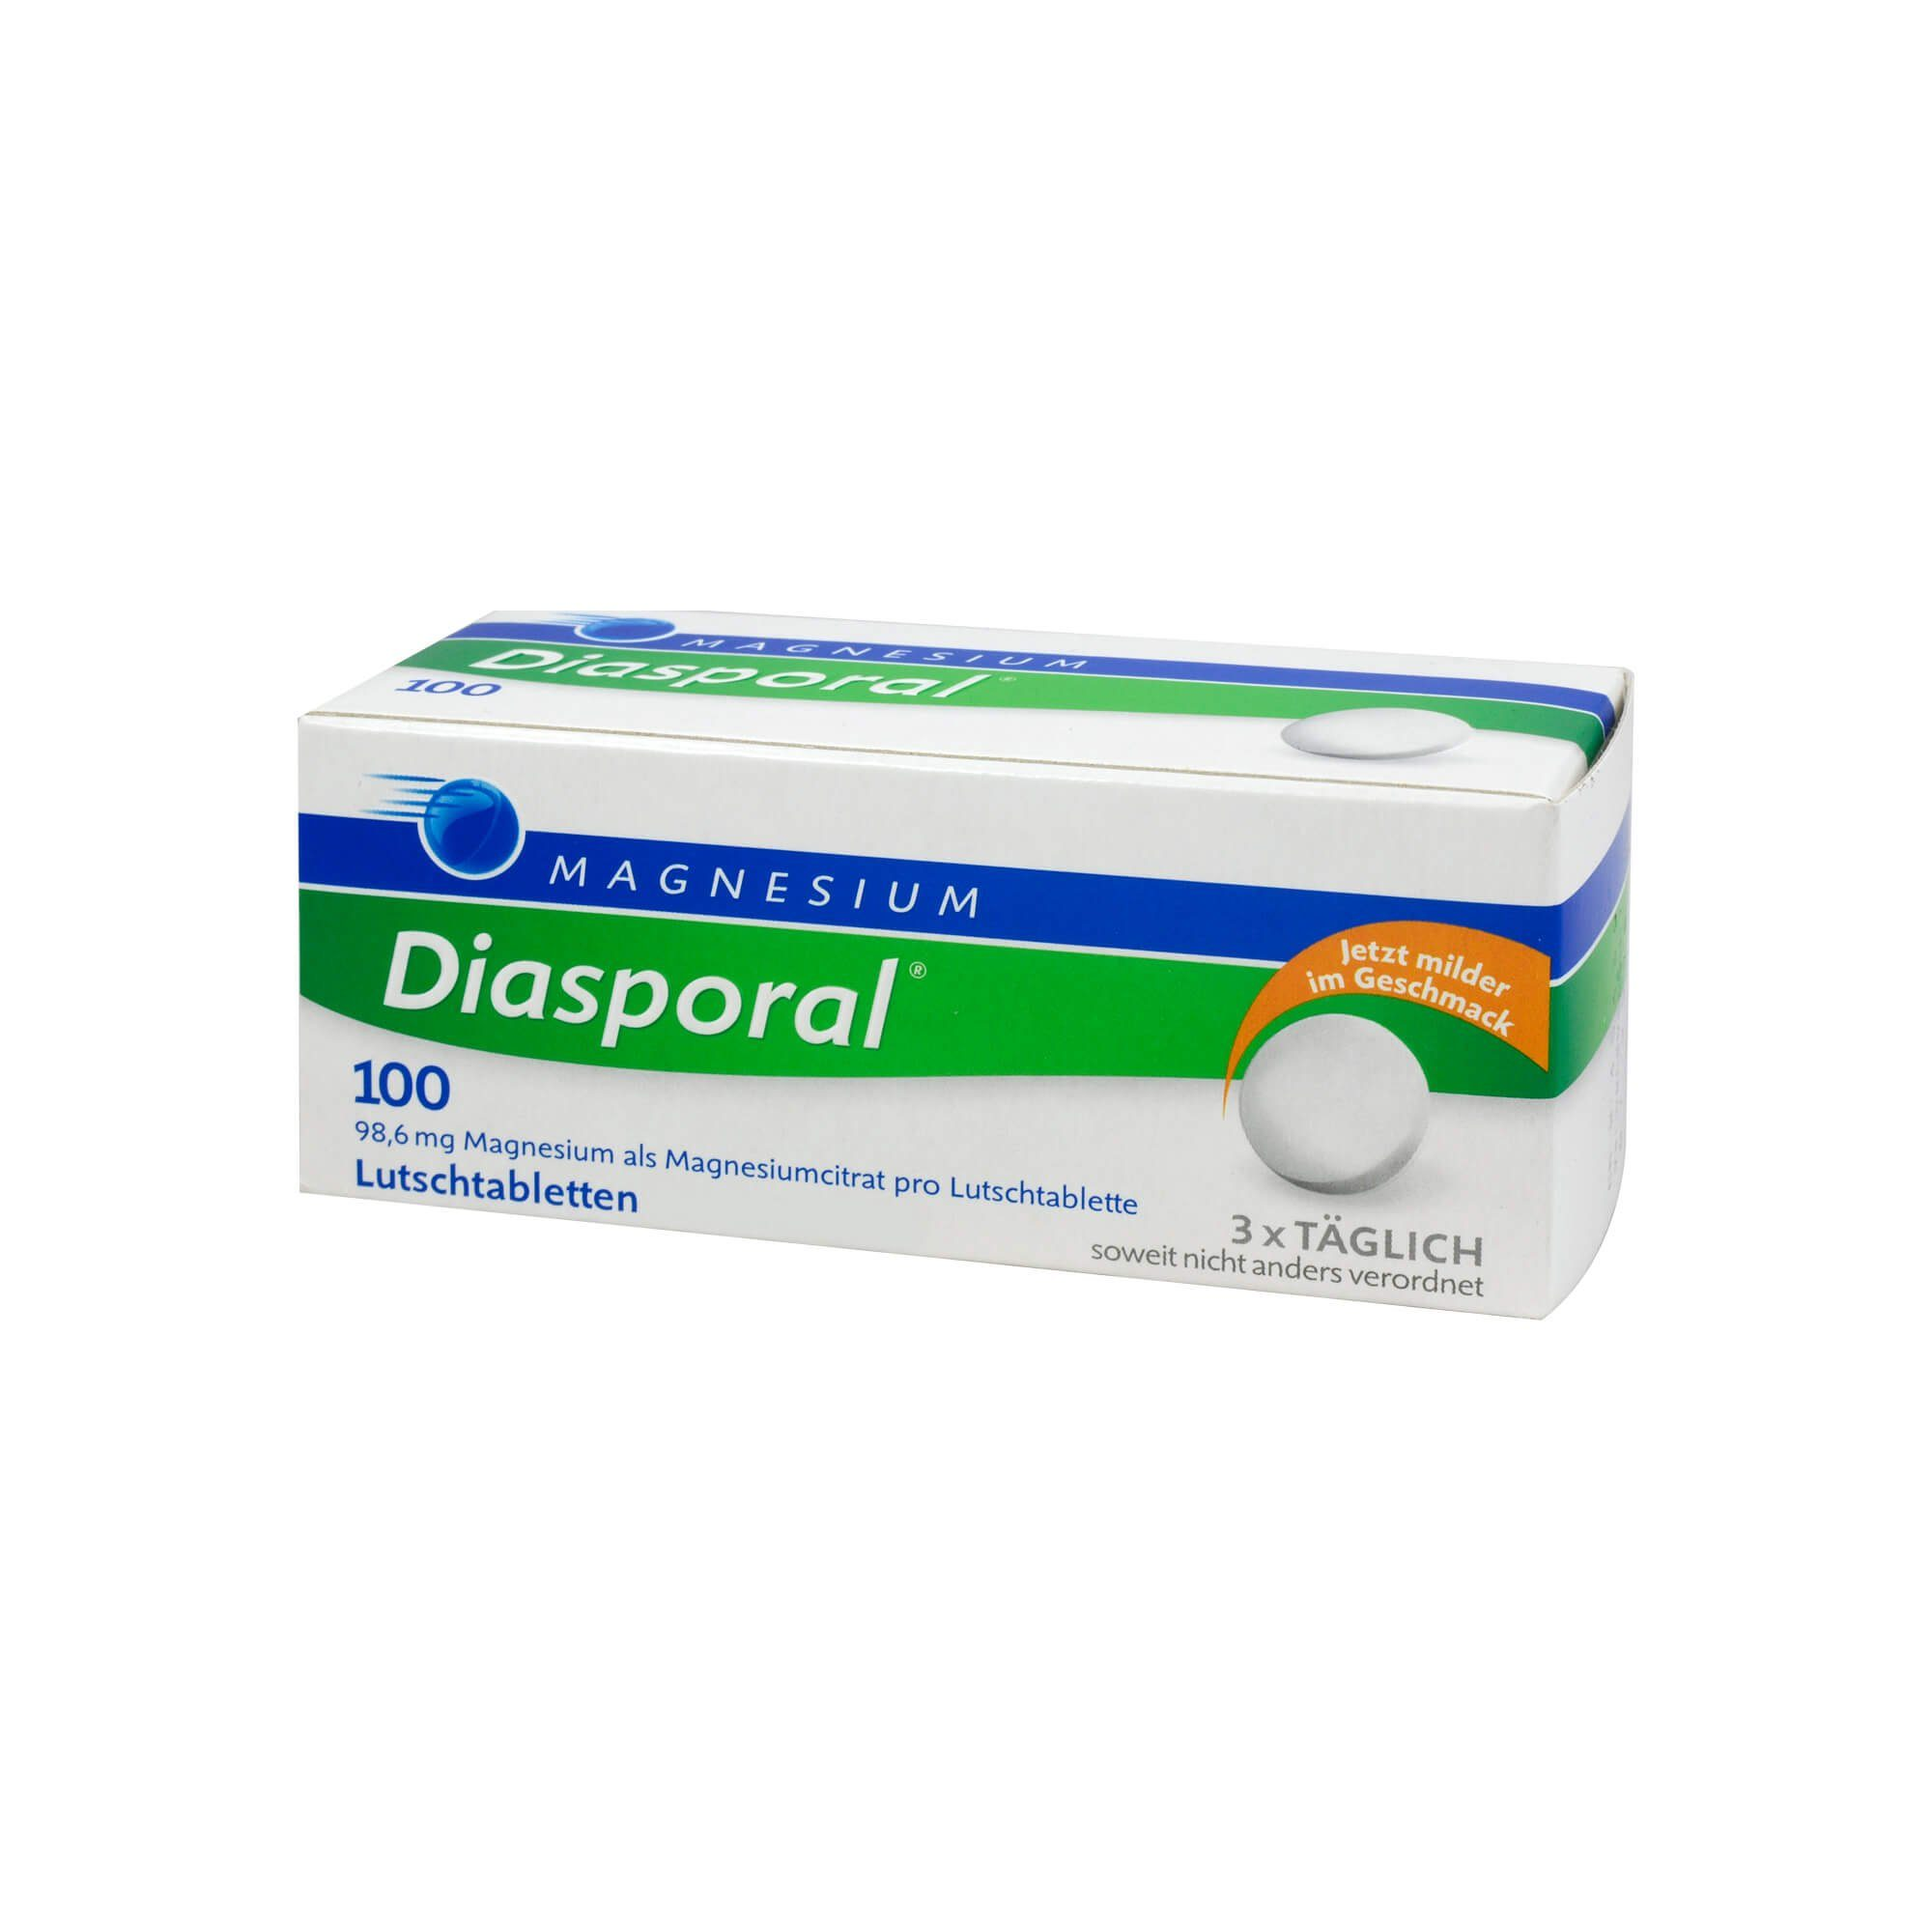 Diasporal Magnesium DIASPORAL 100 Lutschtabletten , 100 St